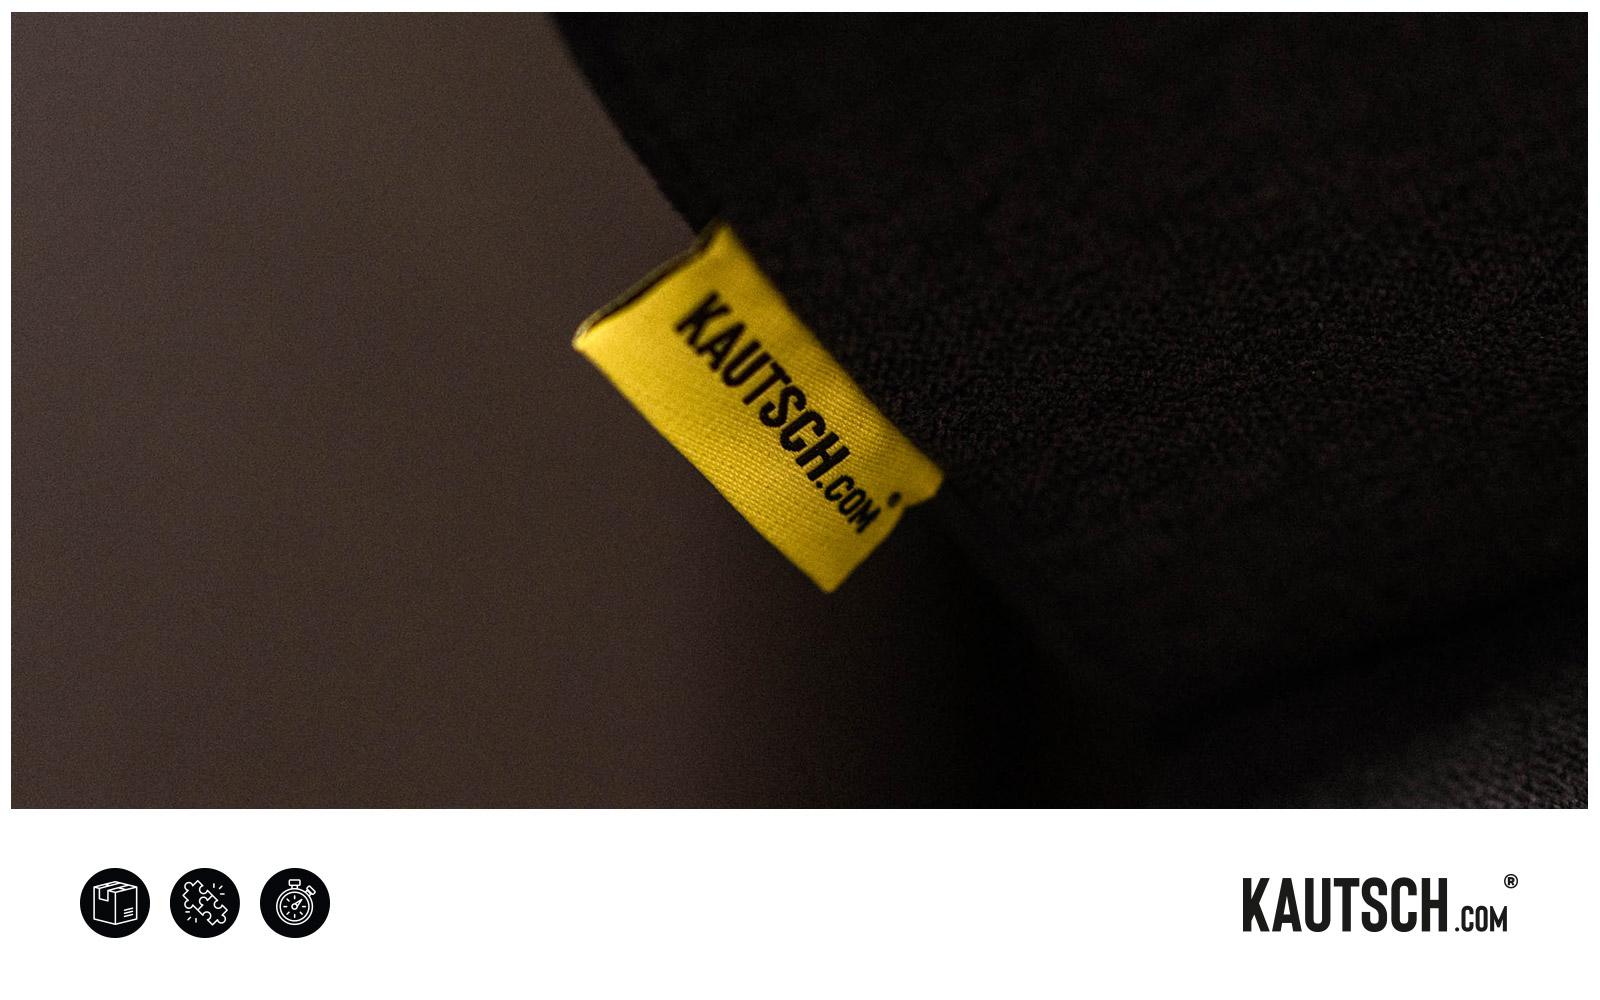 KAUTSCH.com – Label auf dem Sofa